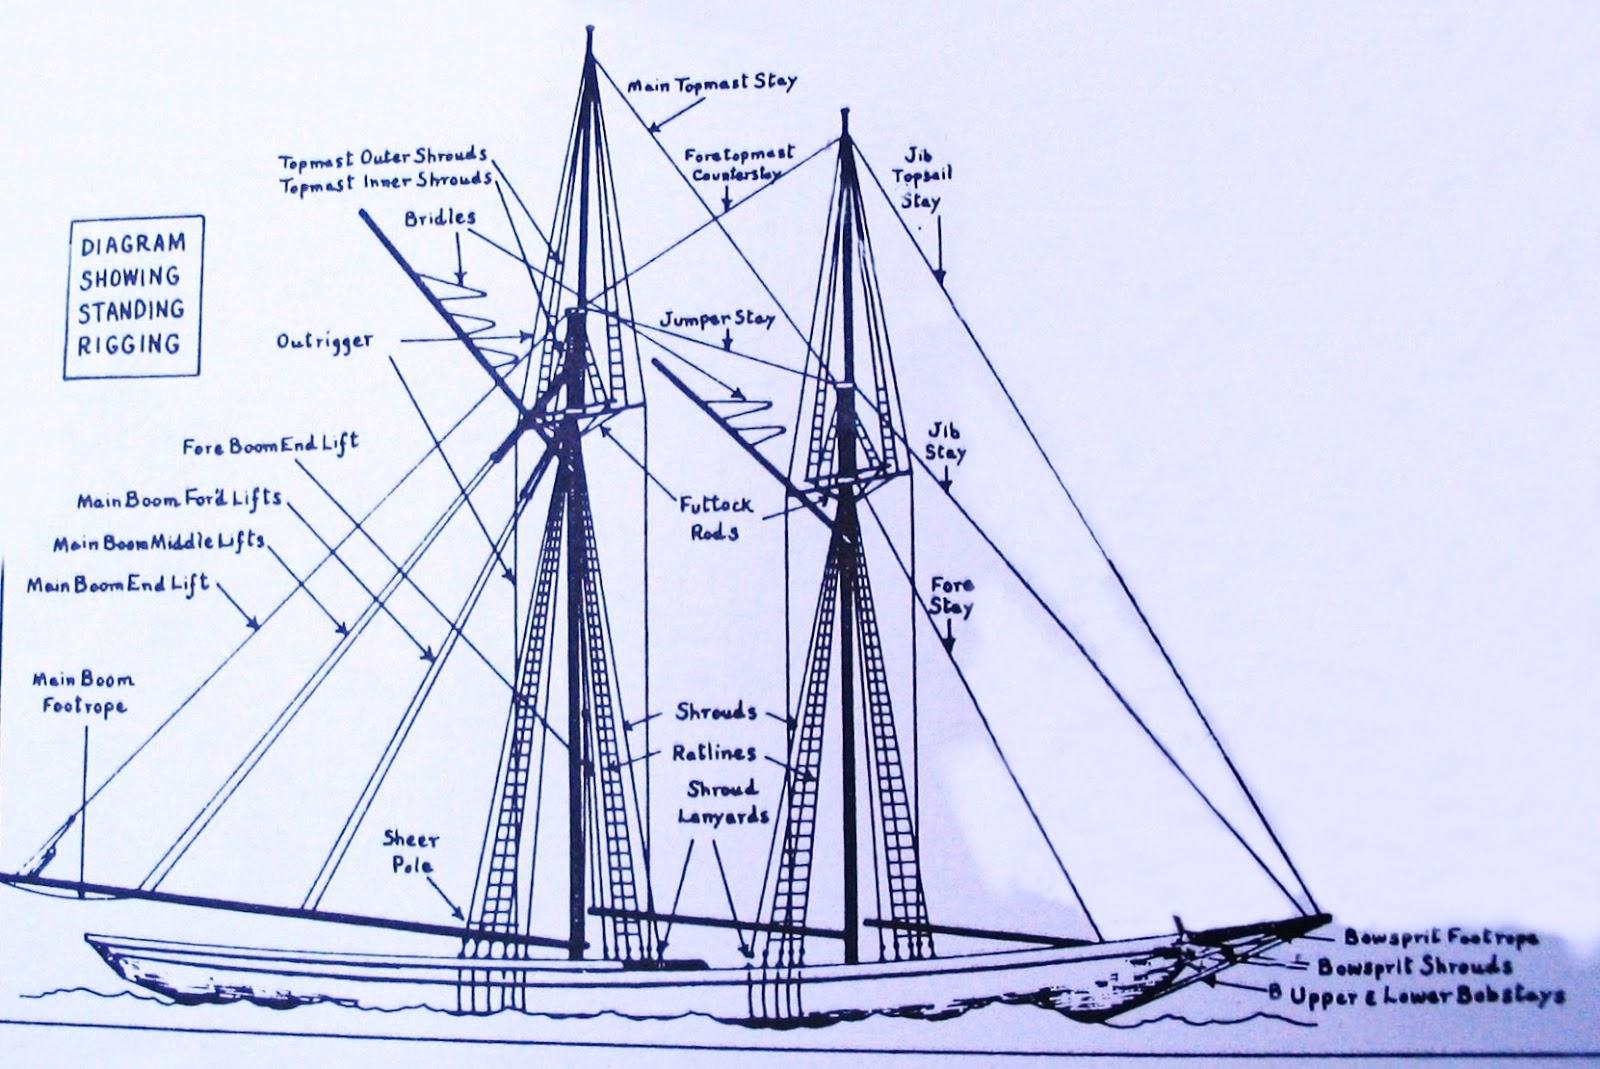 Standing Rigging Diagram Wiring Diagrams Basic Running 29 Images